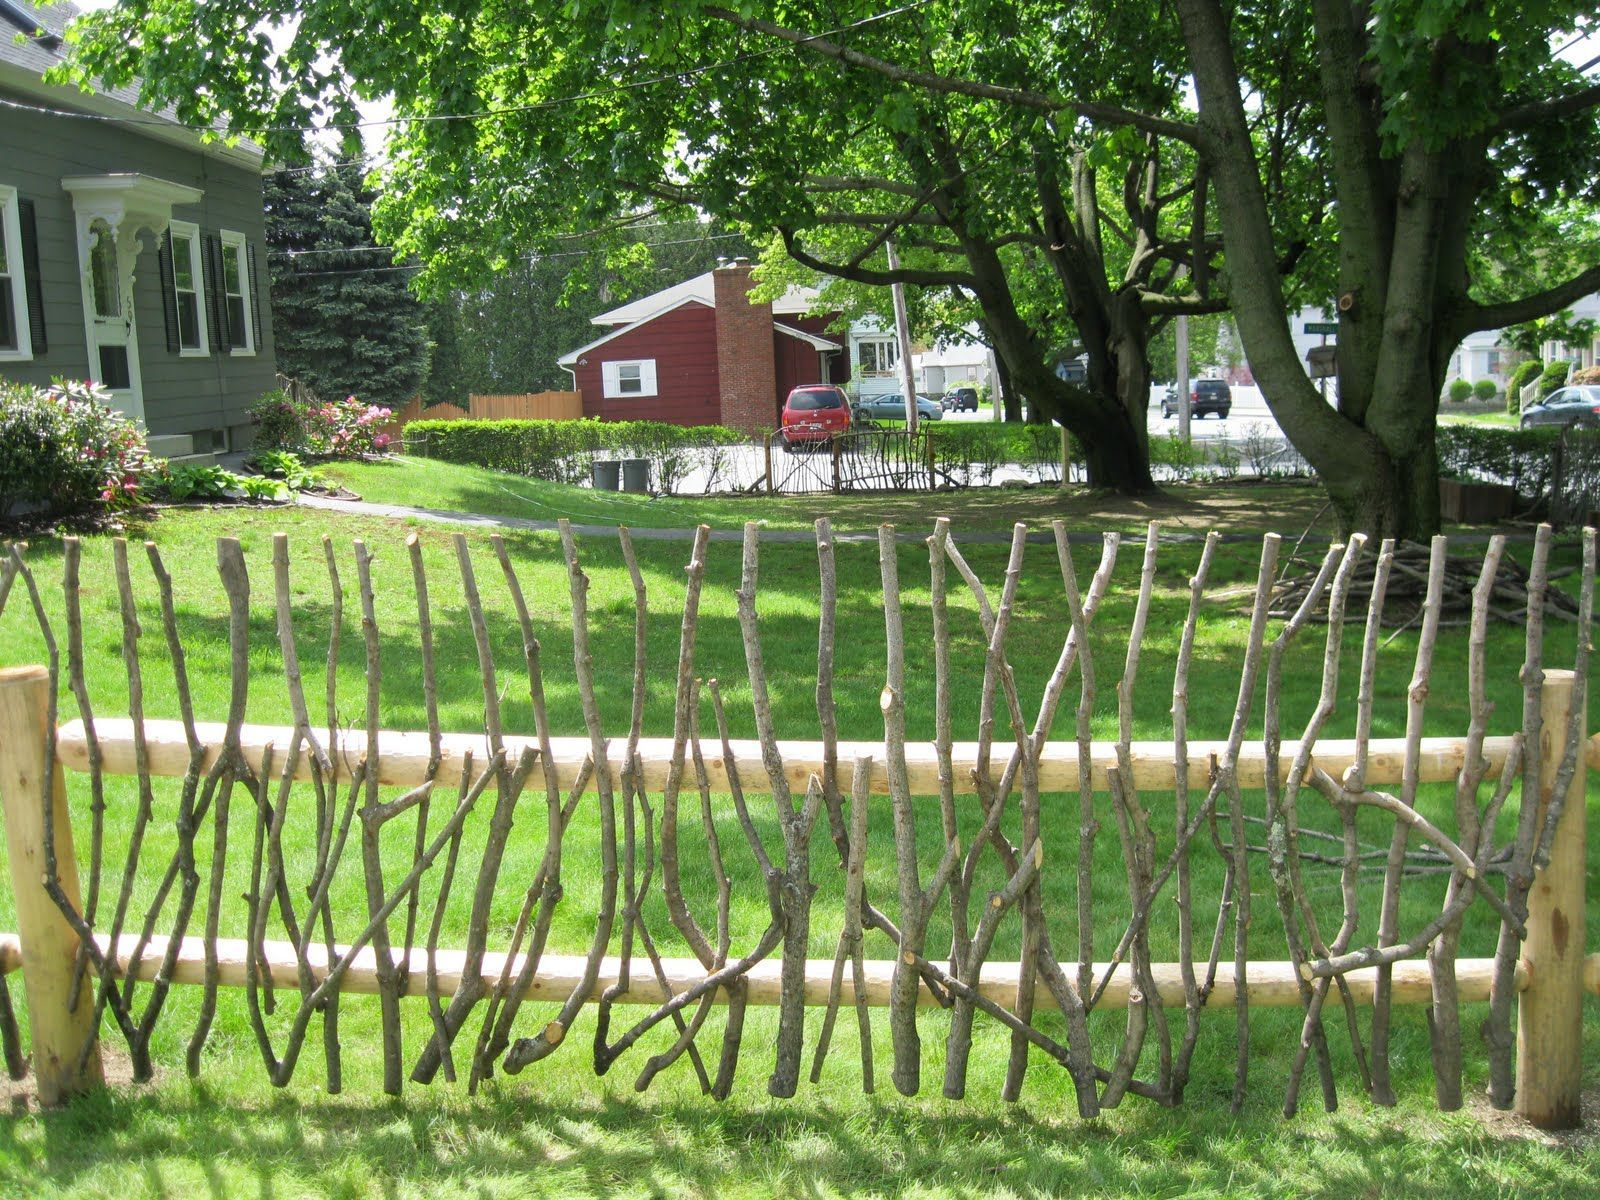 10 Rustic Garden Fence Ideas Elegant And Interesting Rustic